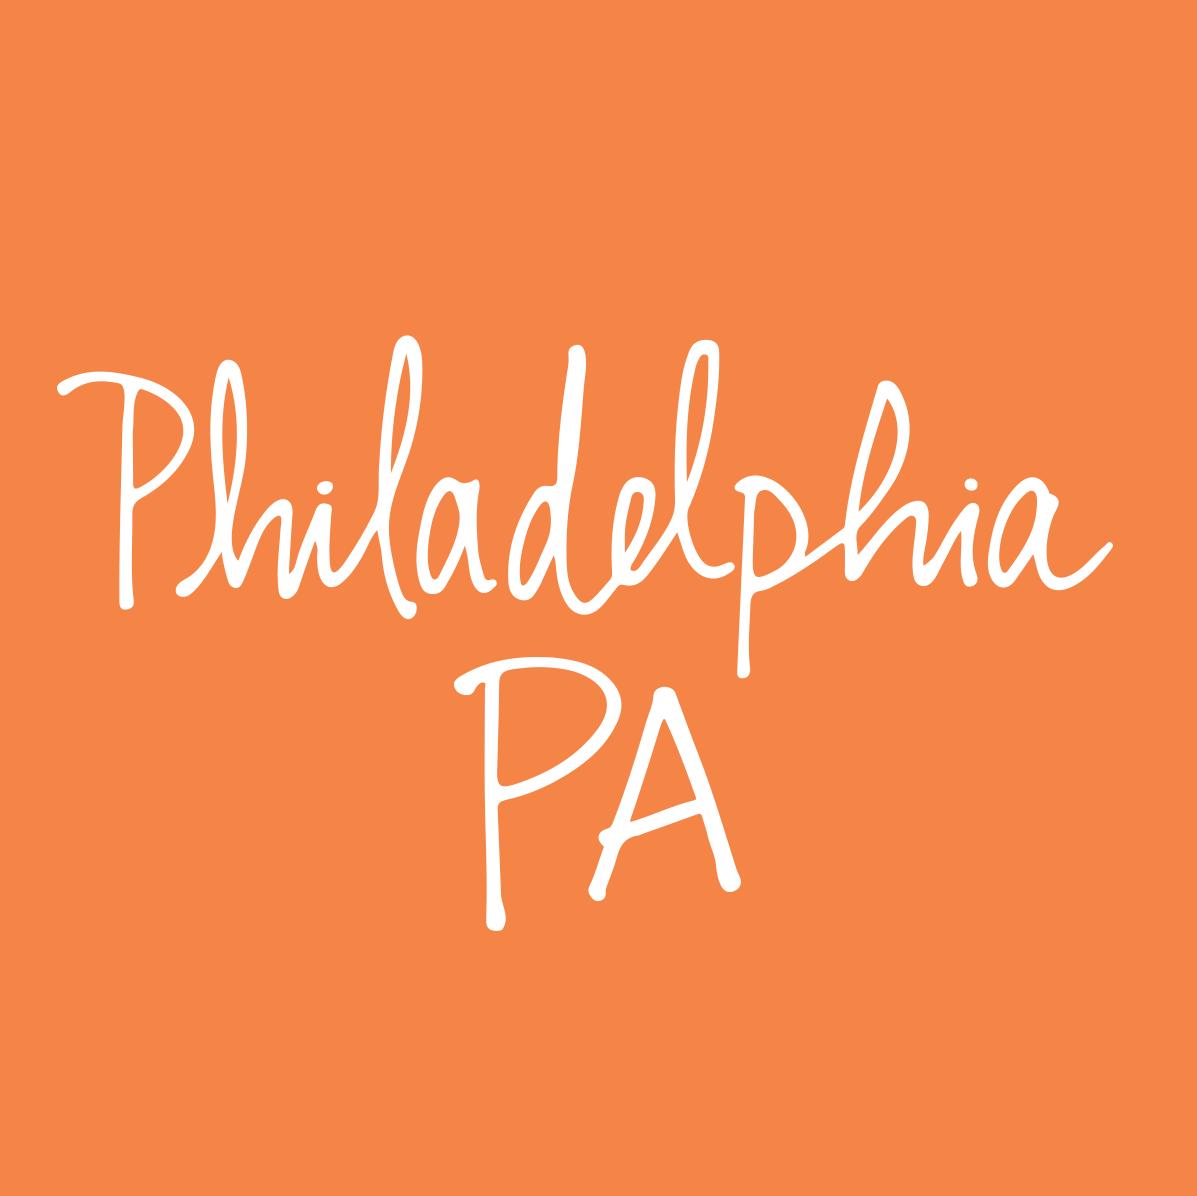 Philadelphia, PA Mobile Tour Stop - May 28 – June 26, 2019